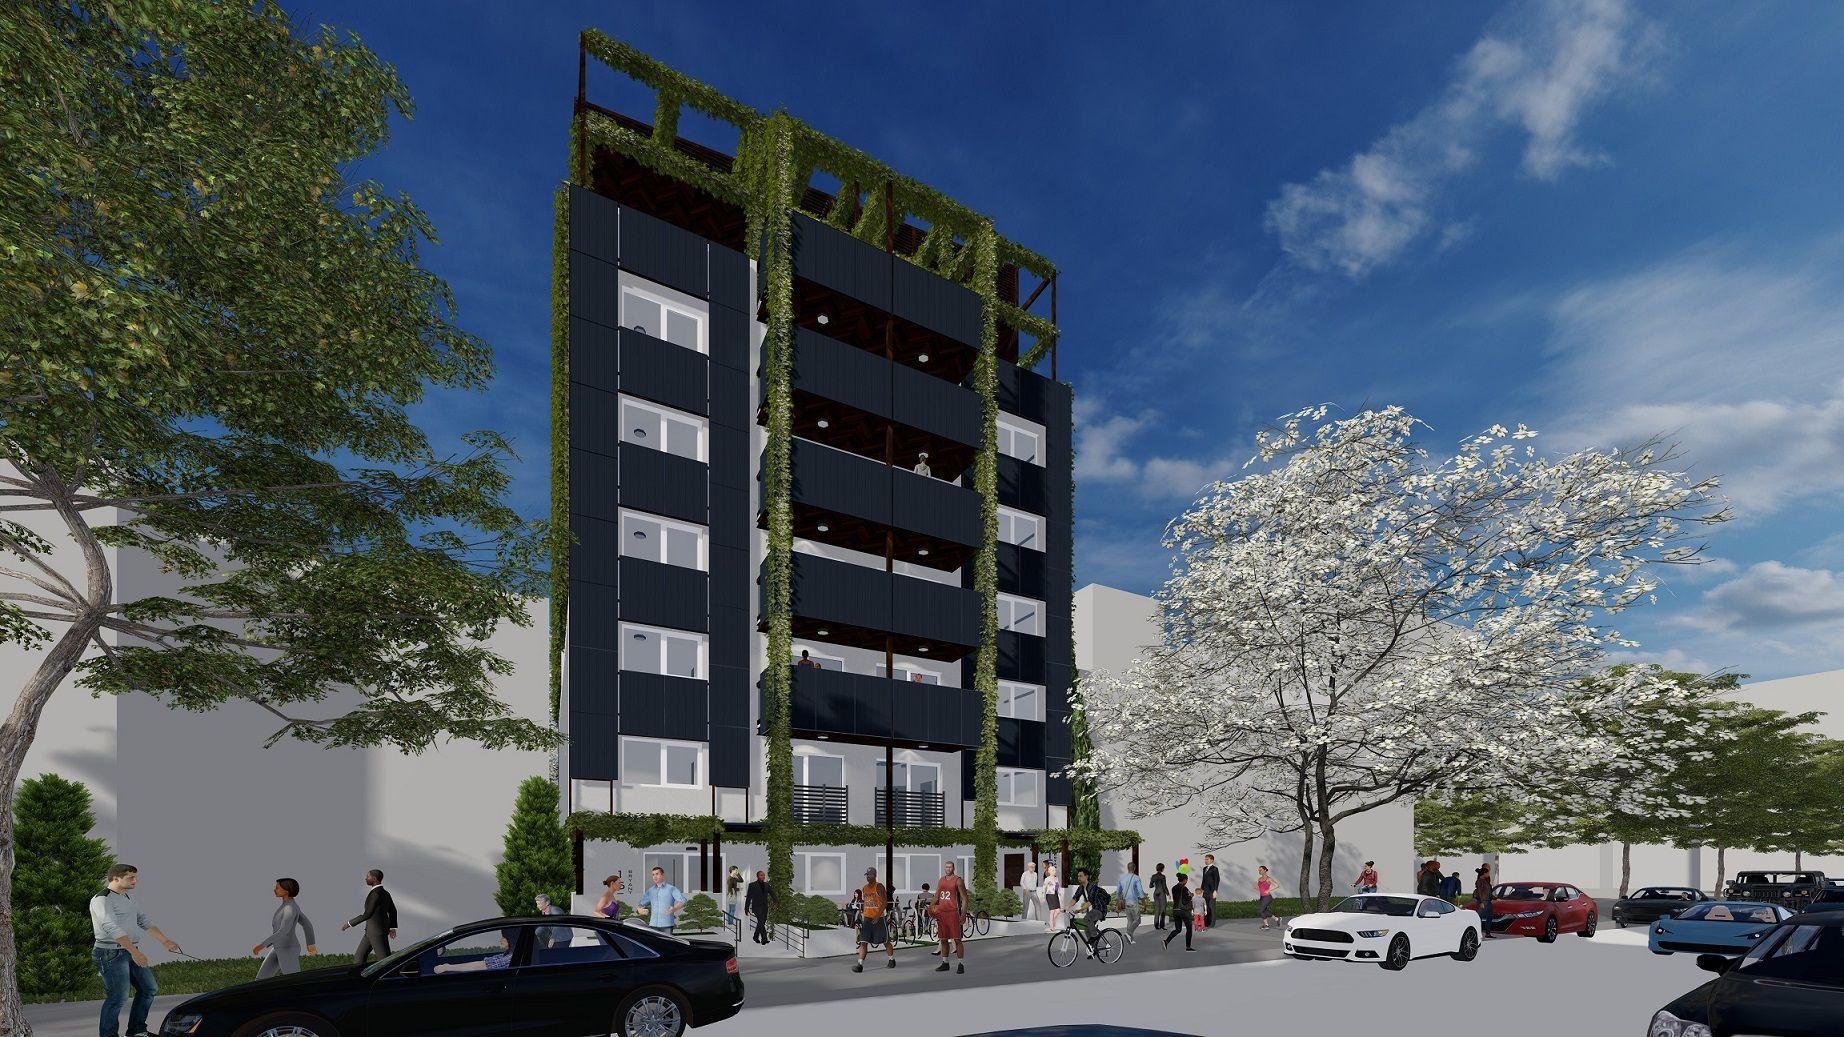 Charlotte Gardens Multi-Family Passive House Project